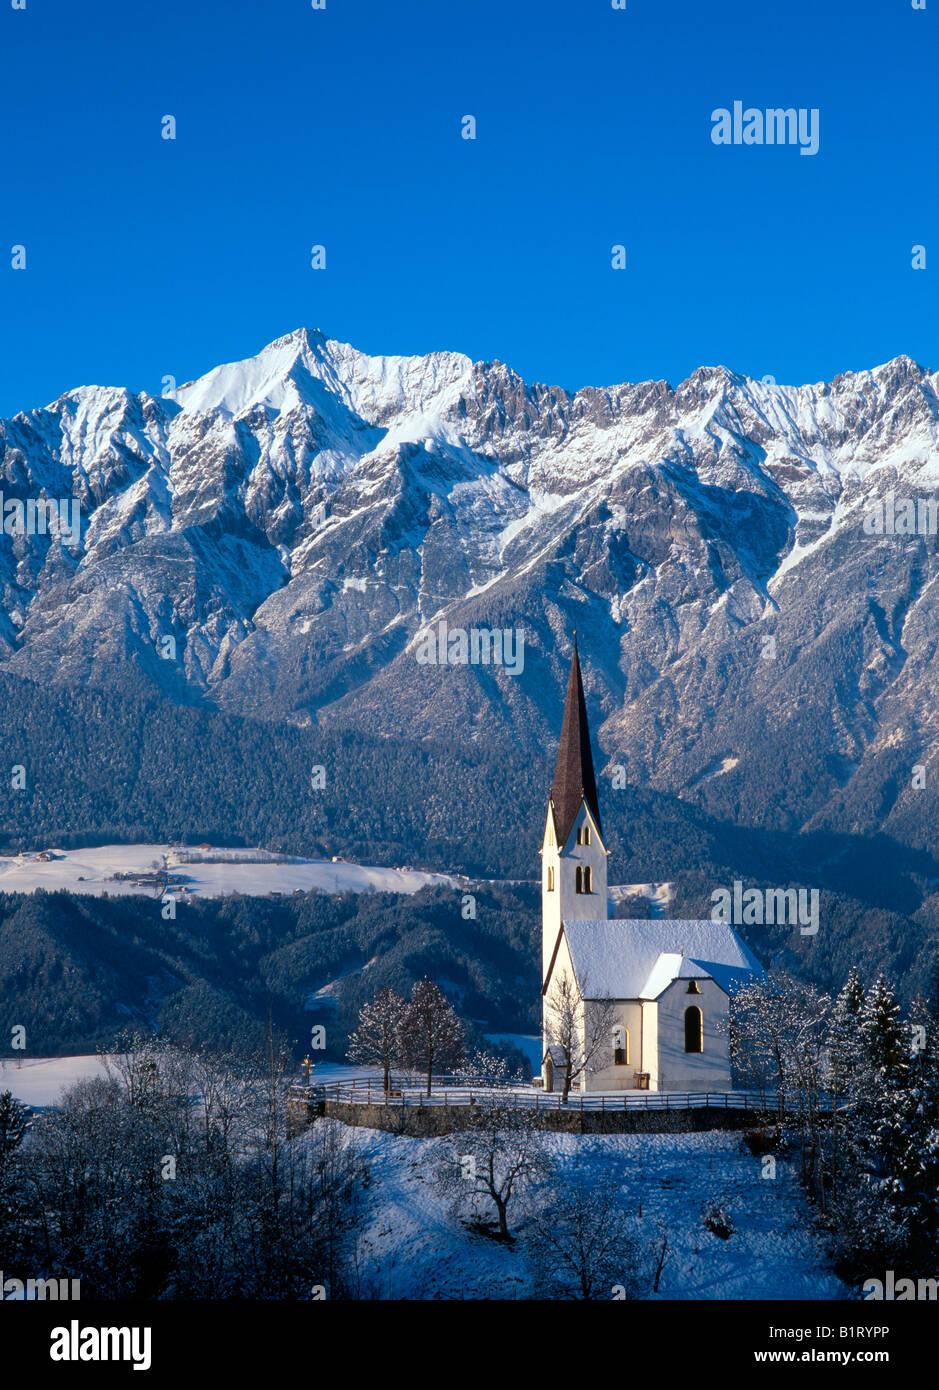 Church of St. Peter, Weerberg, Tyrol, Austria, Europe - Stock Image